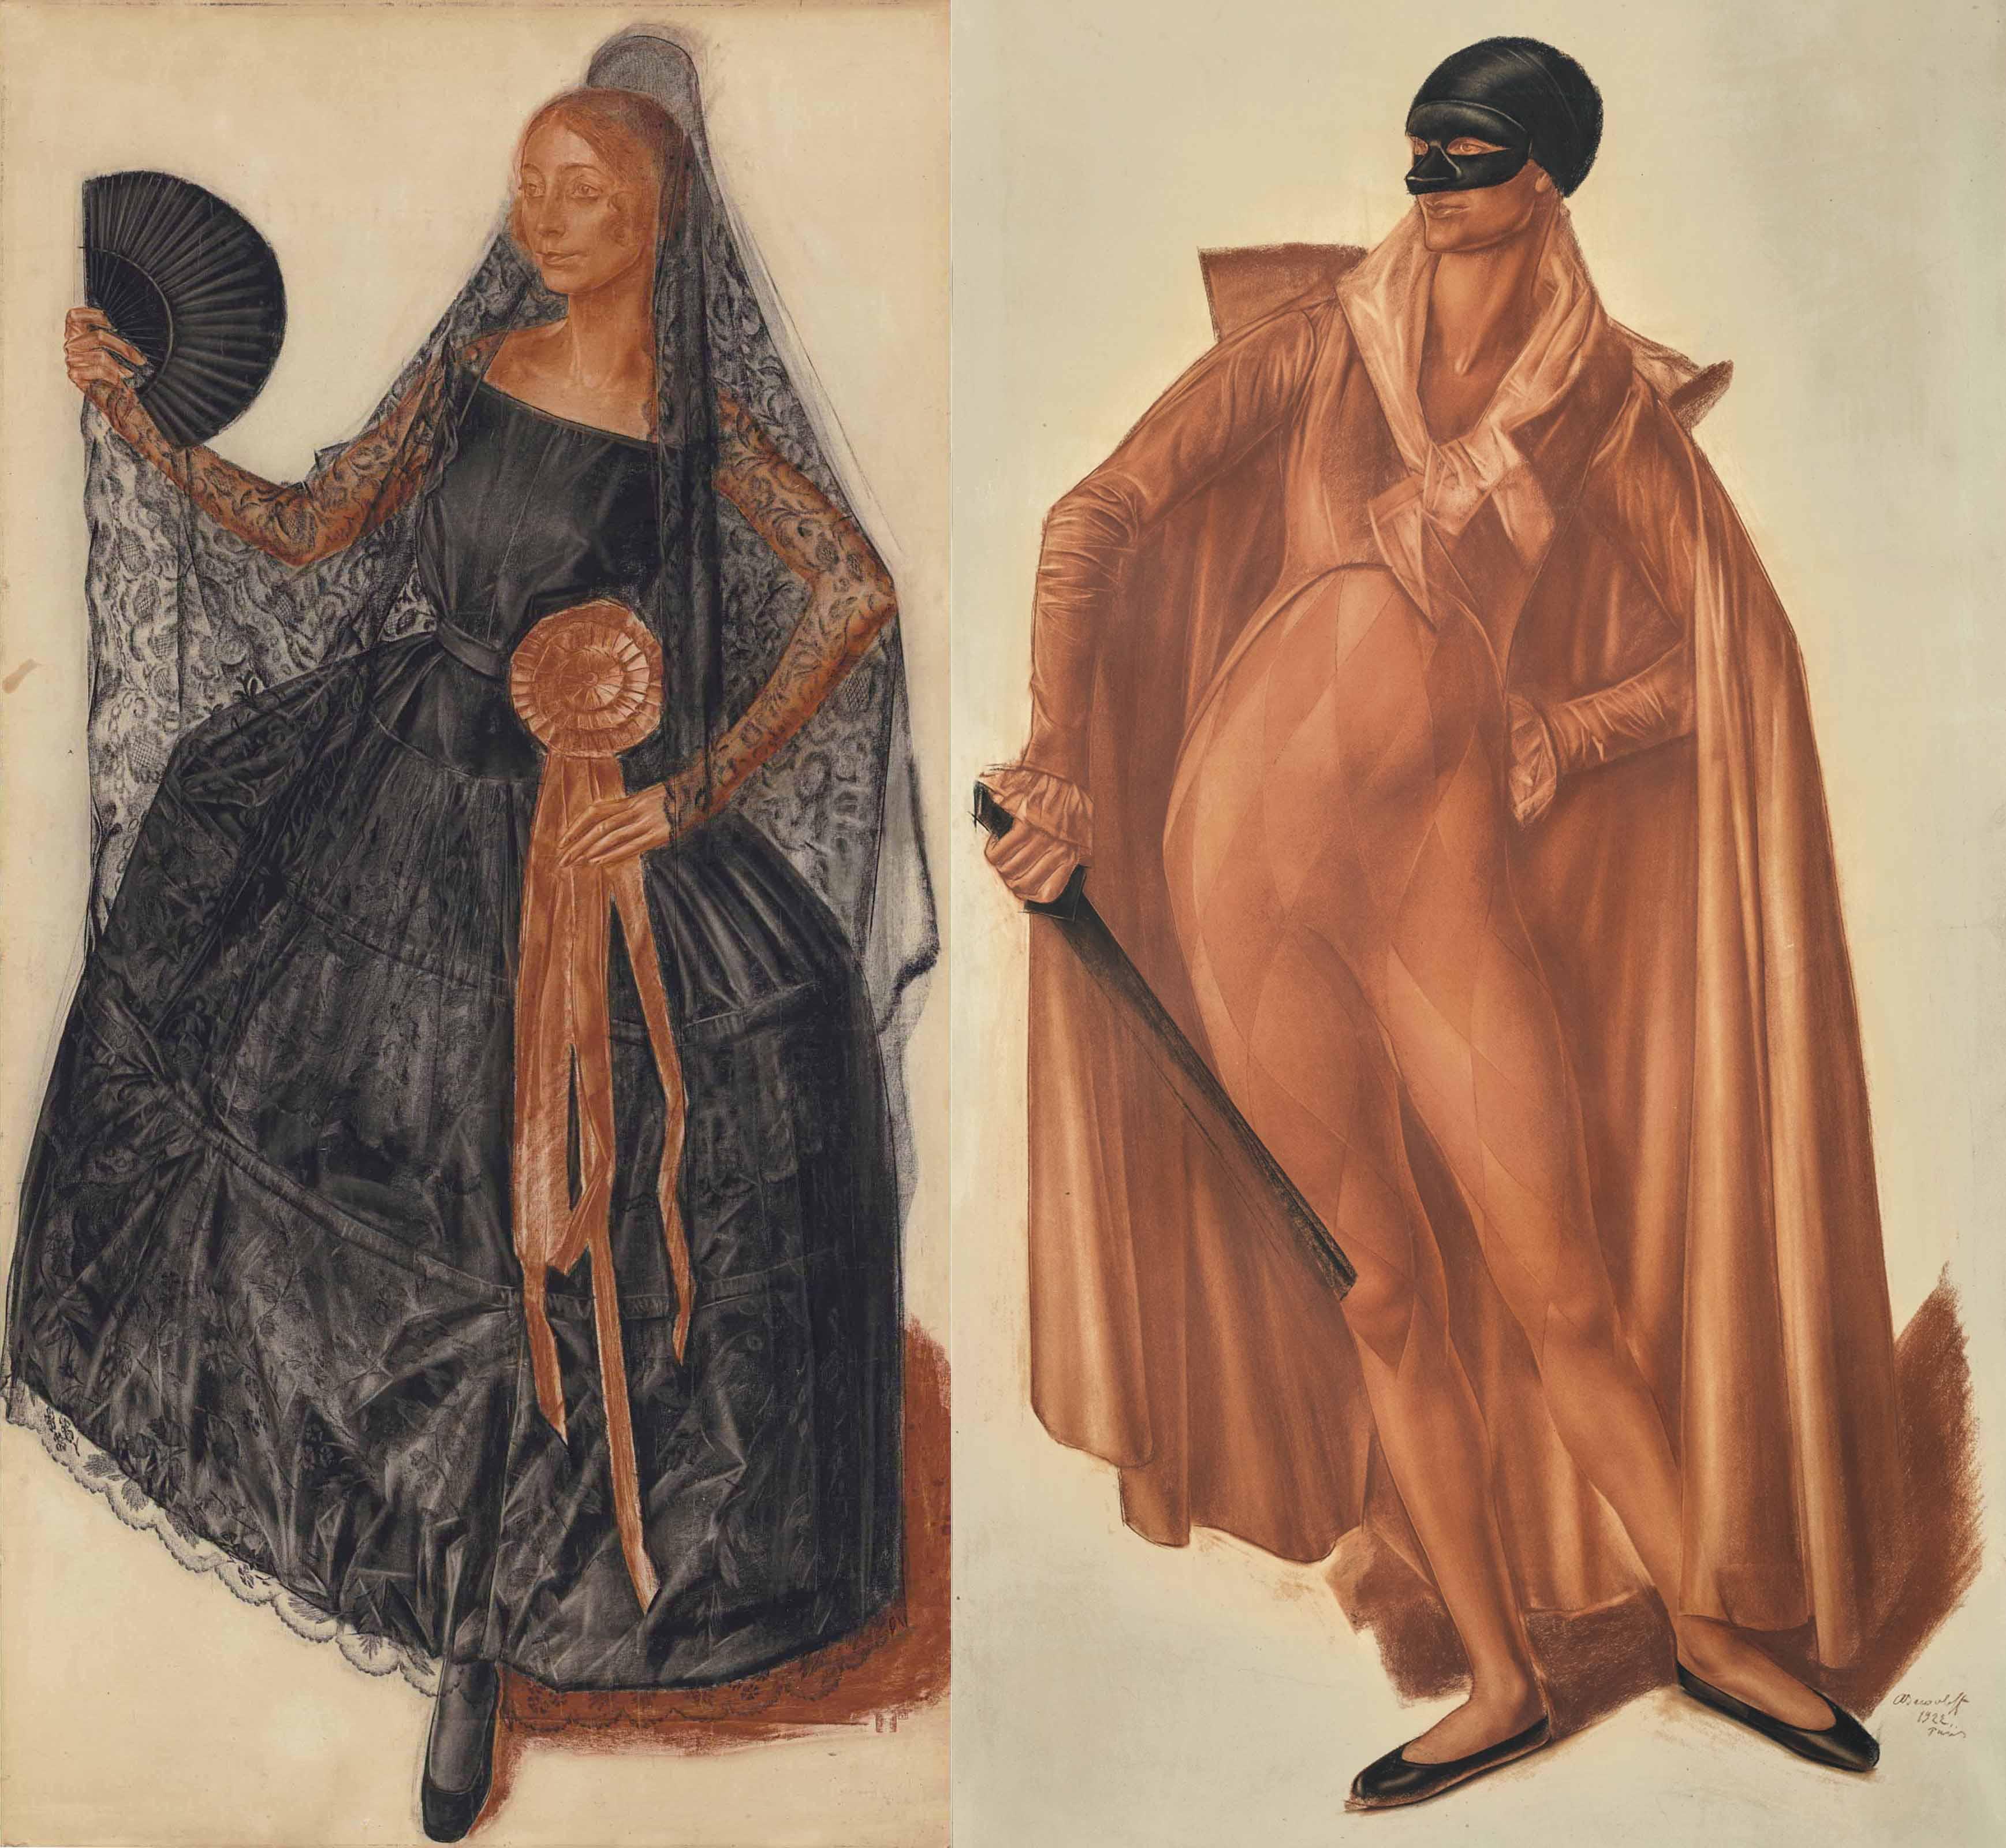 Александр Яковлев. «Танцовщица в испанском костюме» (1924) / «Арлекин» (1922)